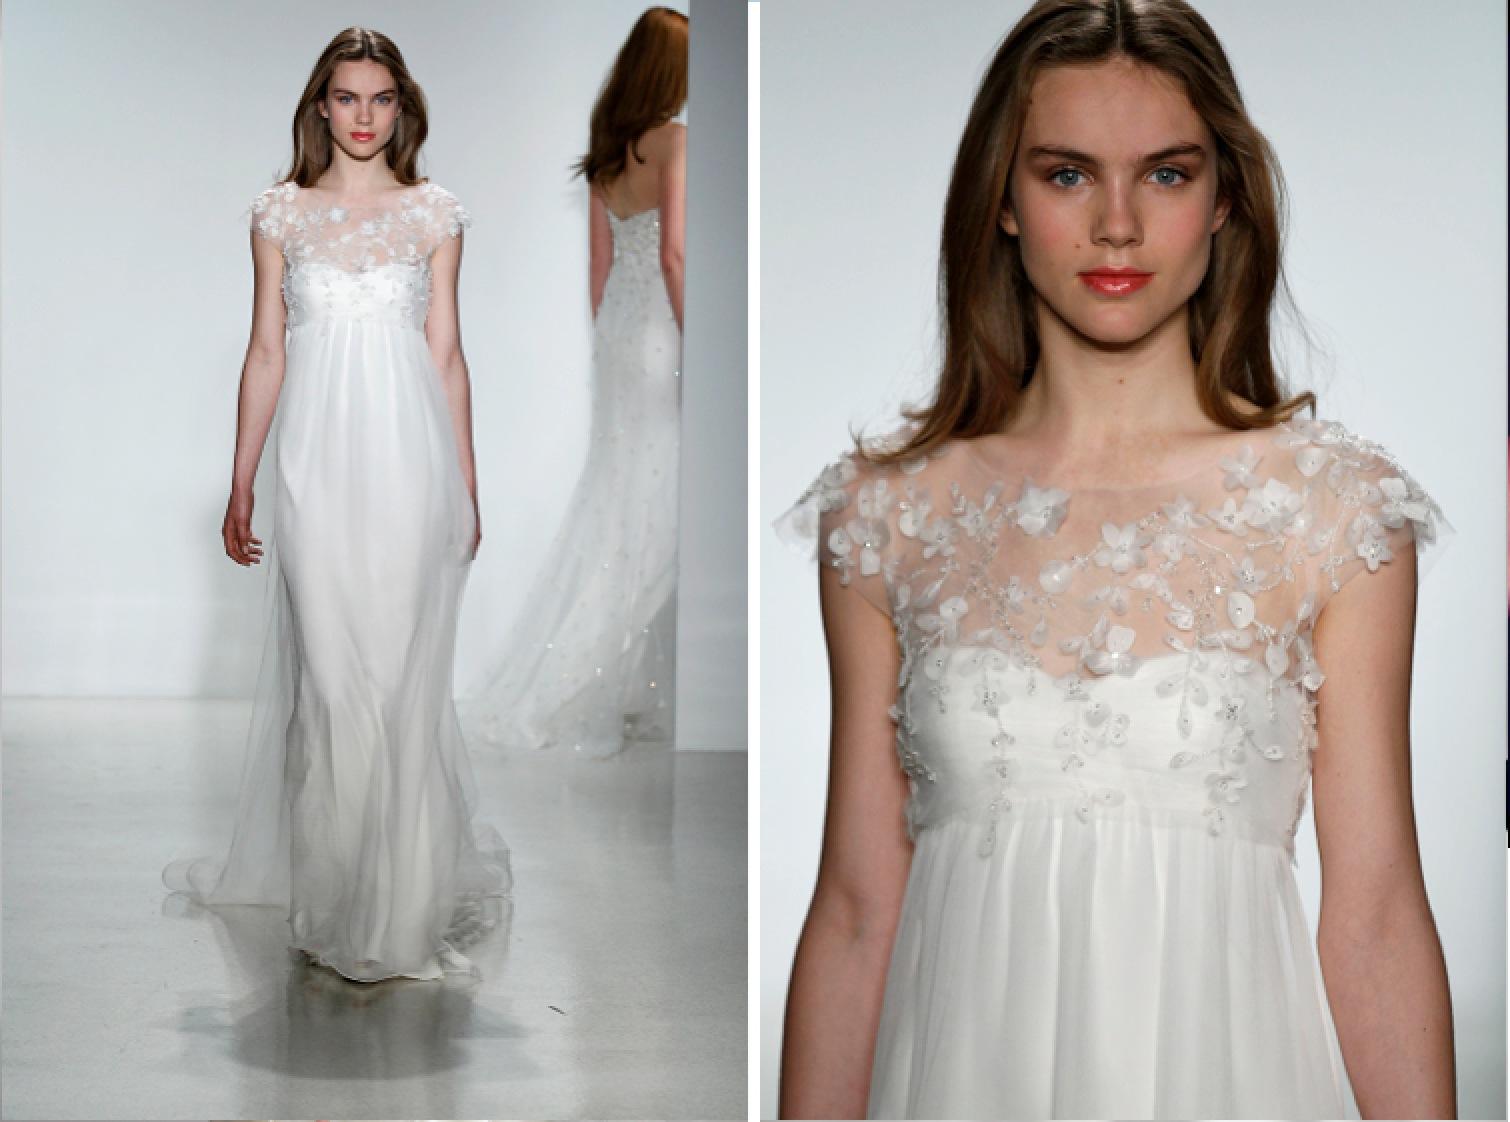 Wedding Dresses, Illusion Neckline Wedding Dresses, Romantic Wedding Dresses, Fashion, Spring Weddings, Boho Chic Weddings, Garden Weddings, Christos